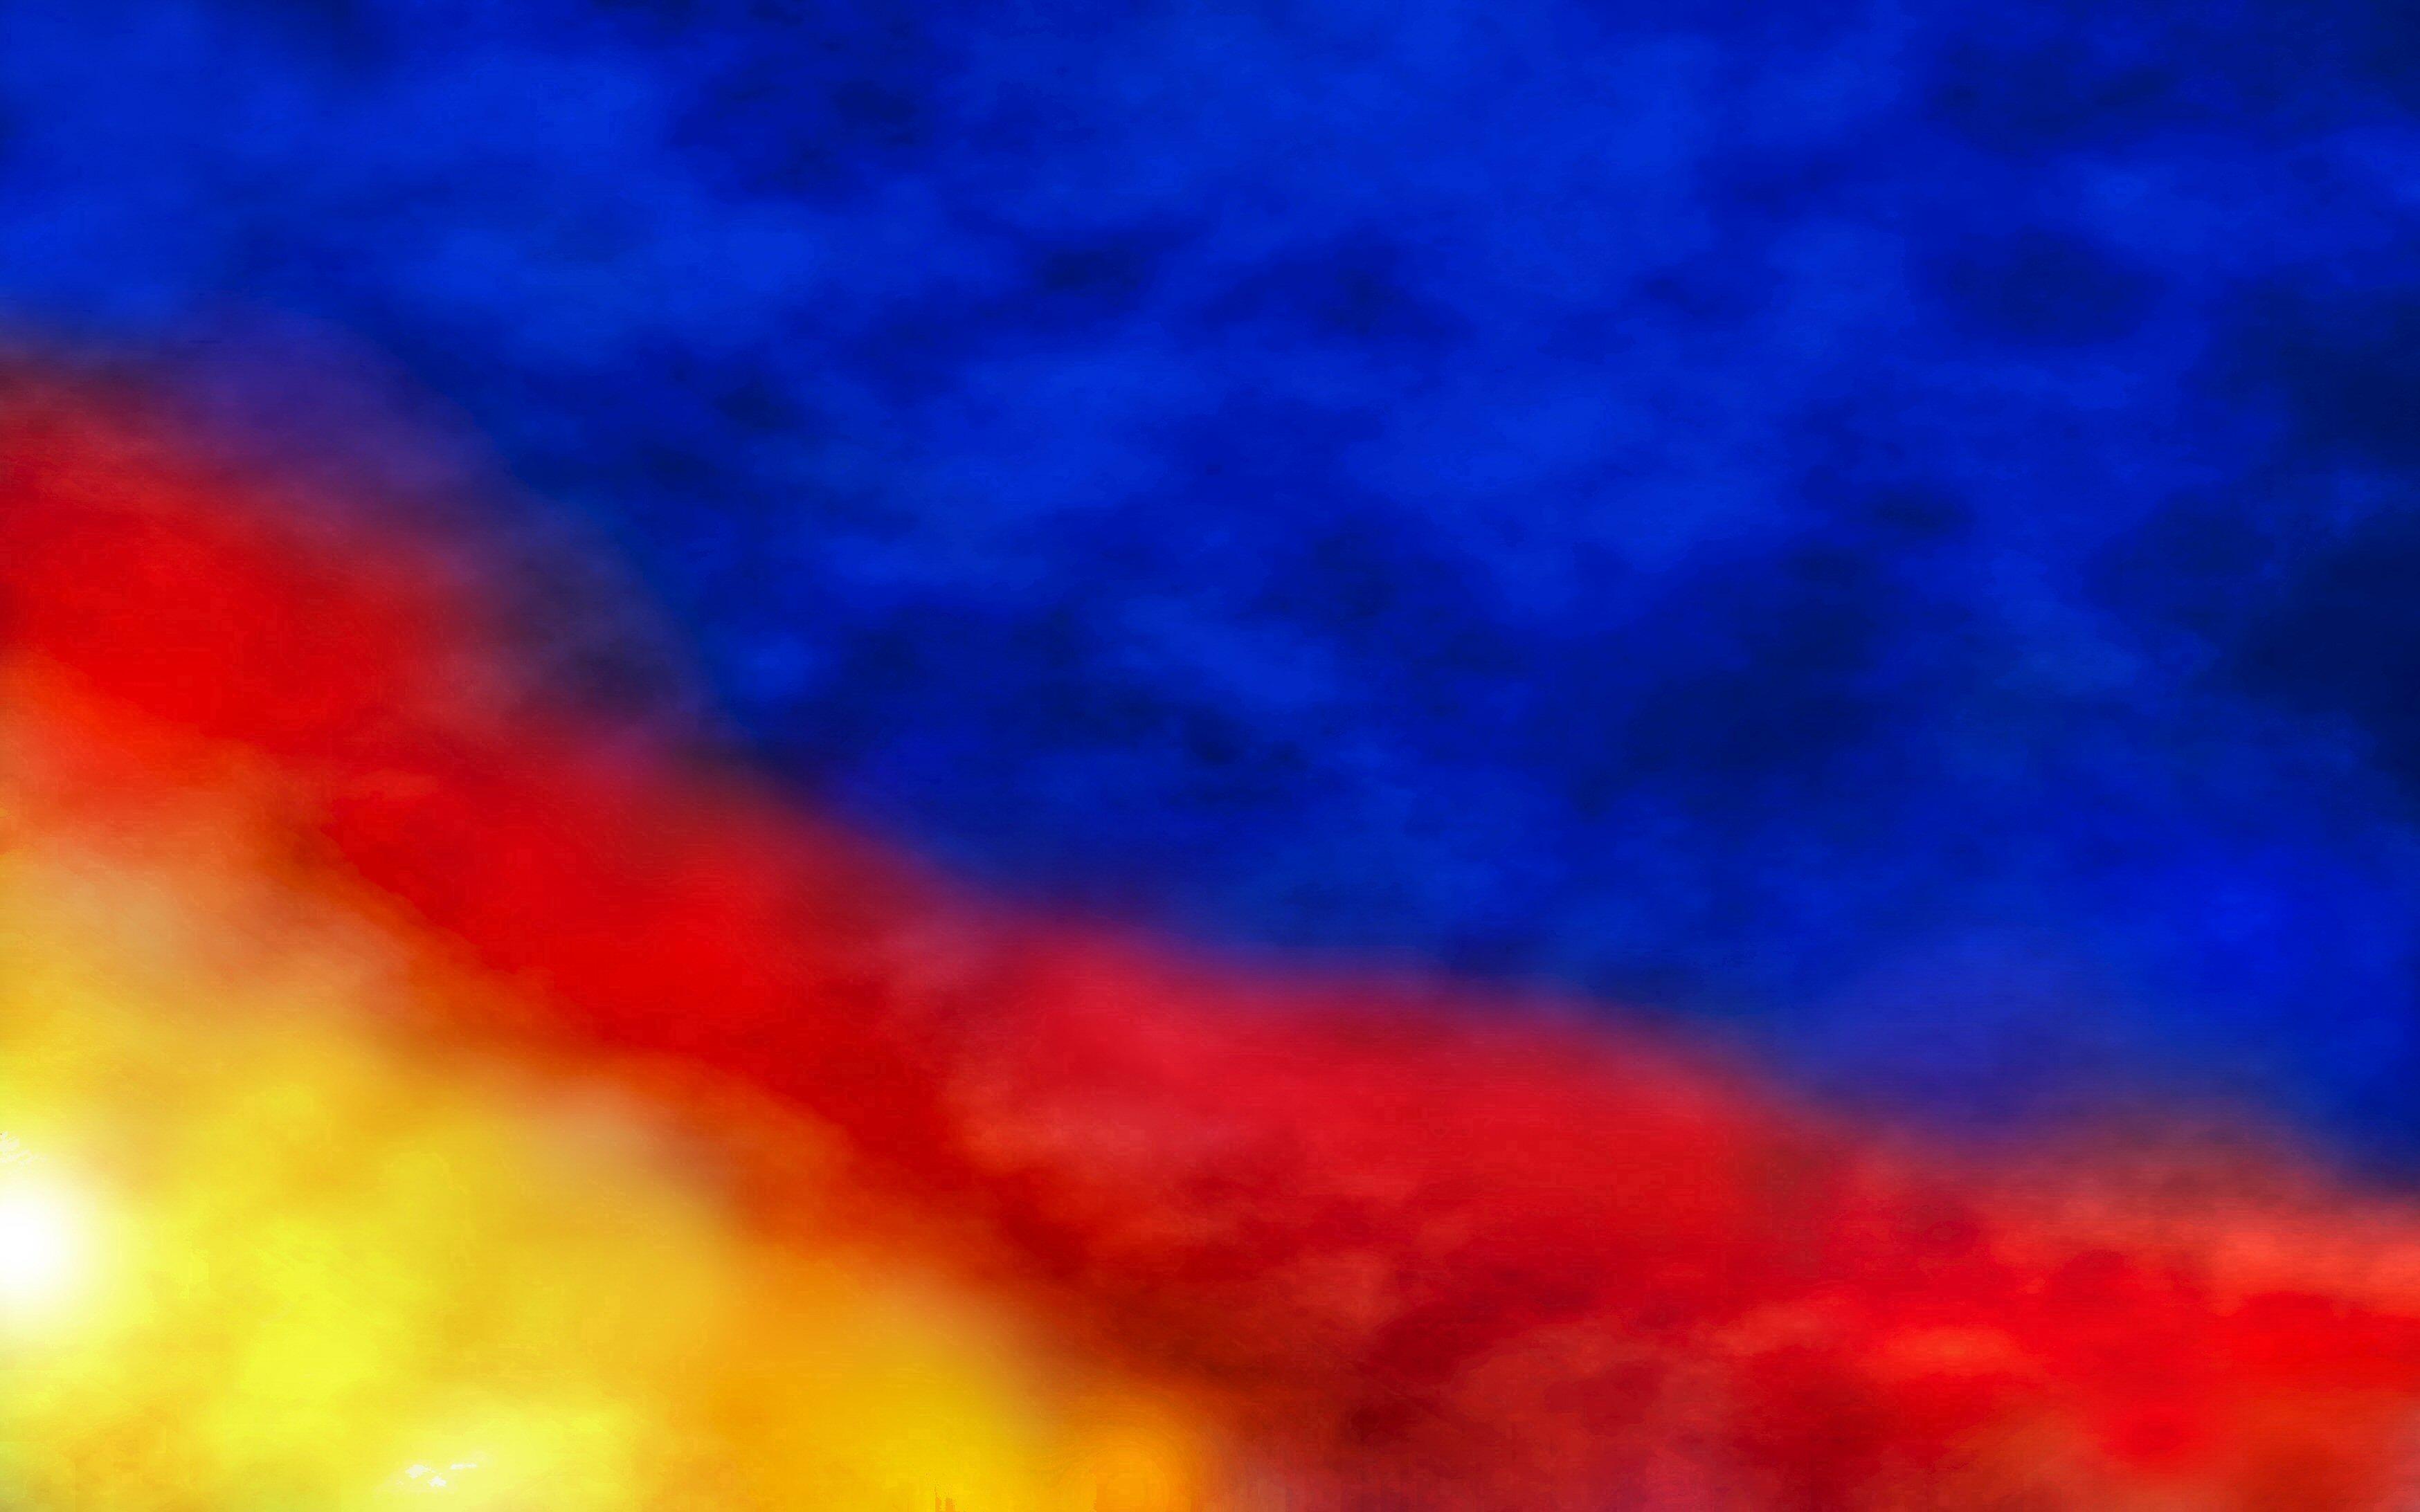 firestorm clouds opus 15064 june2012 full hd wallpaper and background image 3496x2185 id. Black Bedroom Furniture Sets. Home Design Ideas